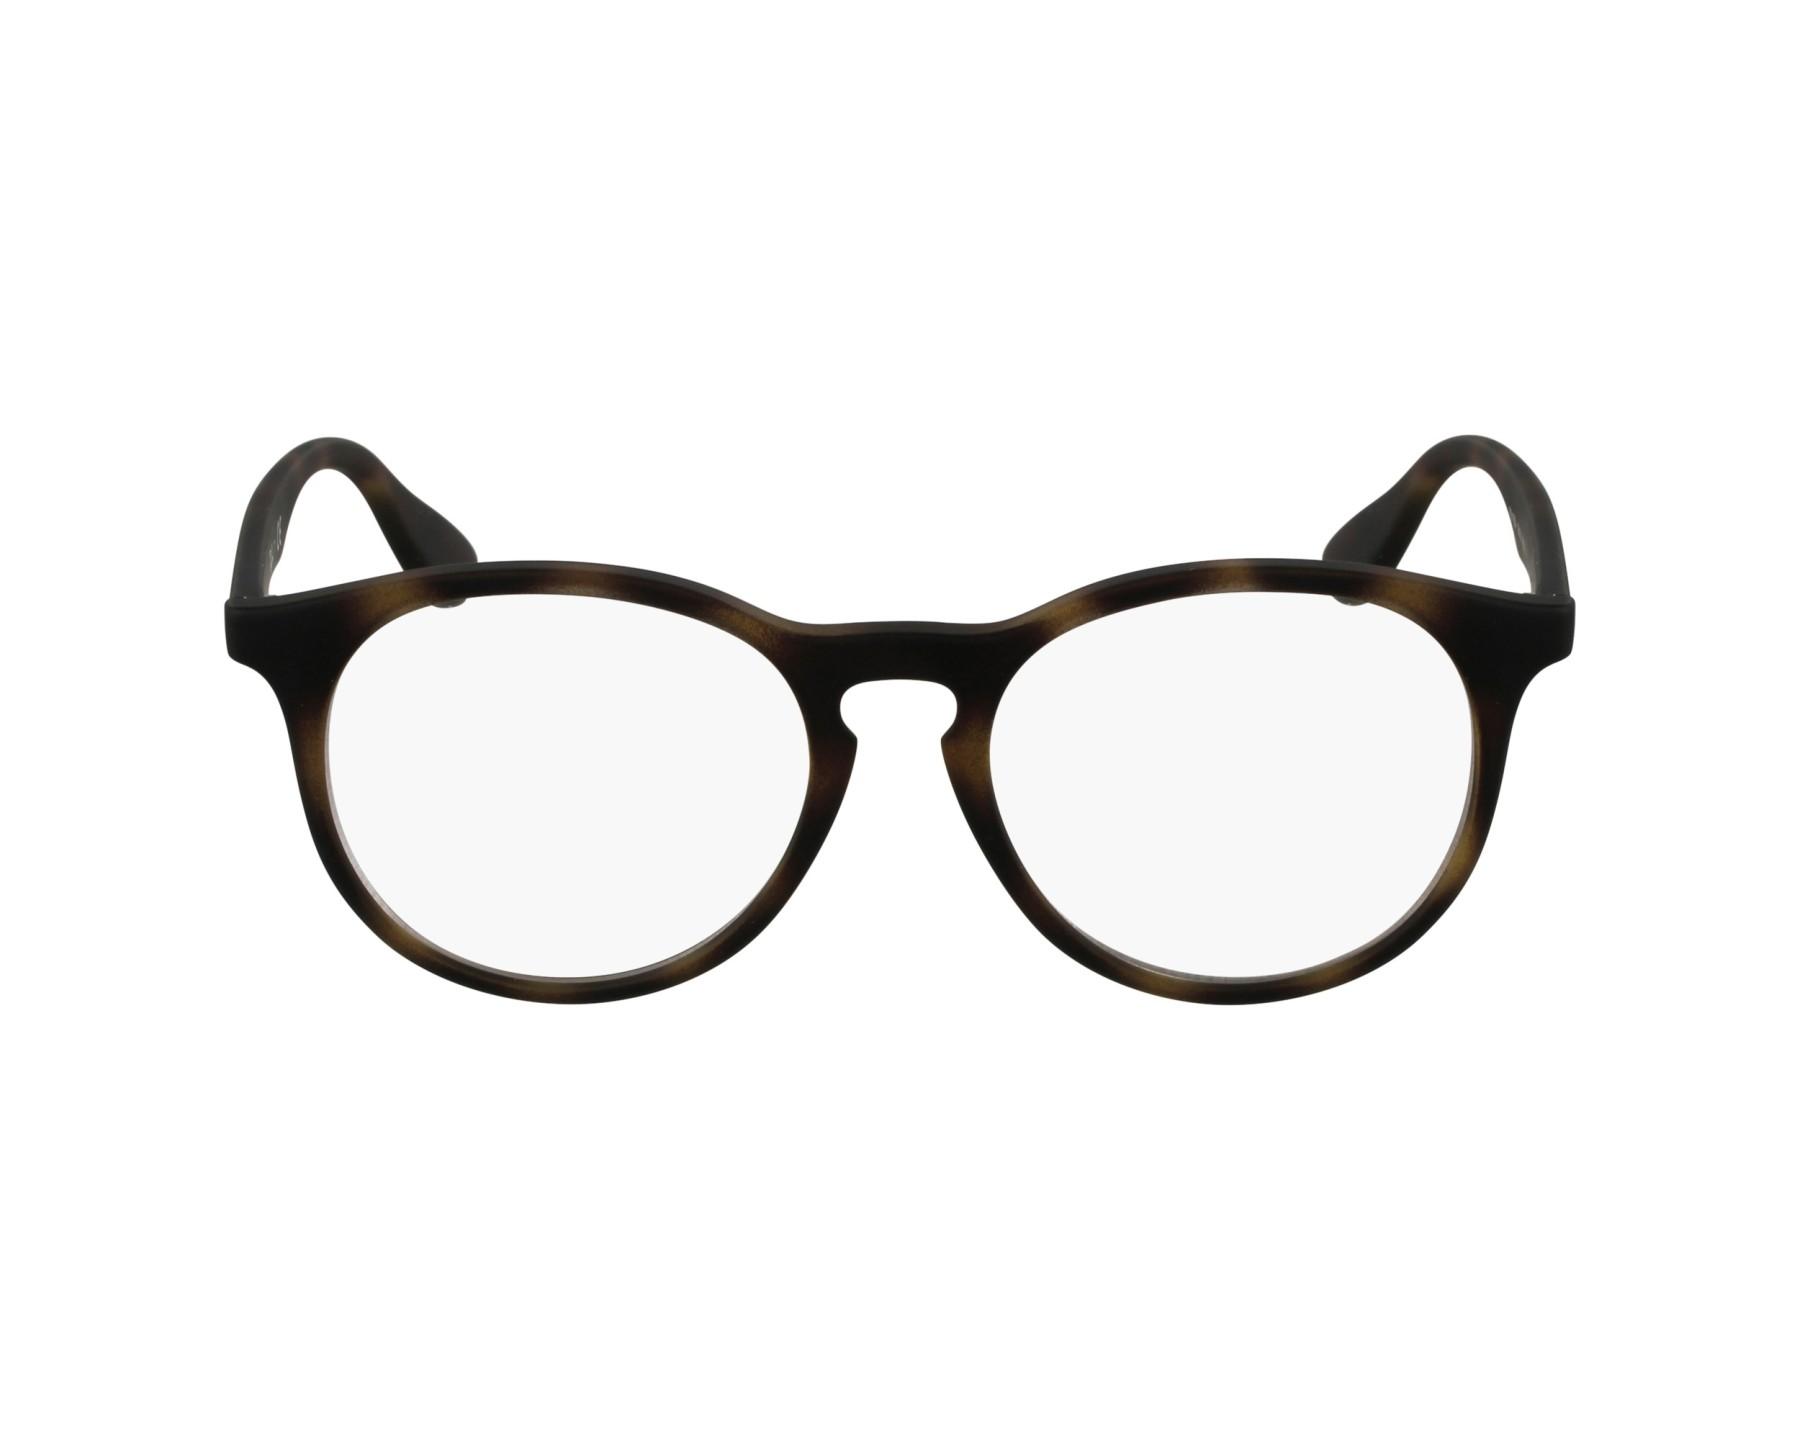 0fb5ce8e74 eyeglasses Ray-Ban RY-1554 3616 48-16 Havana profile view